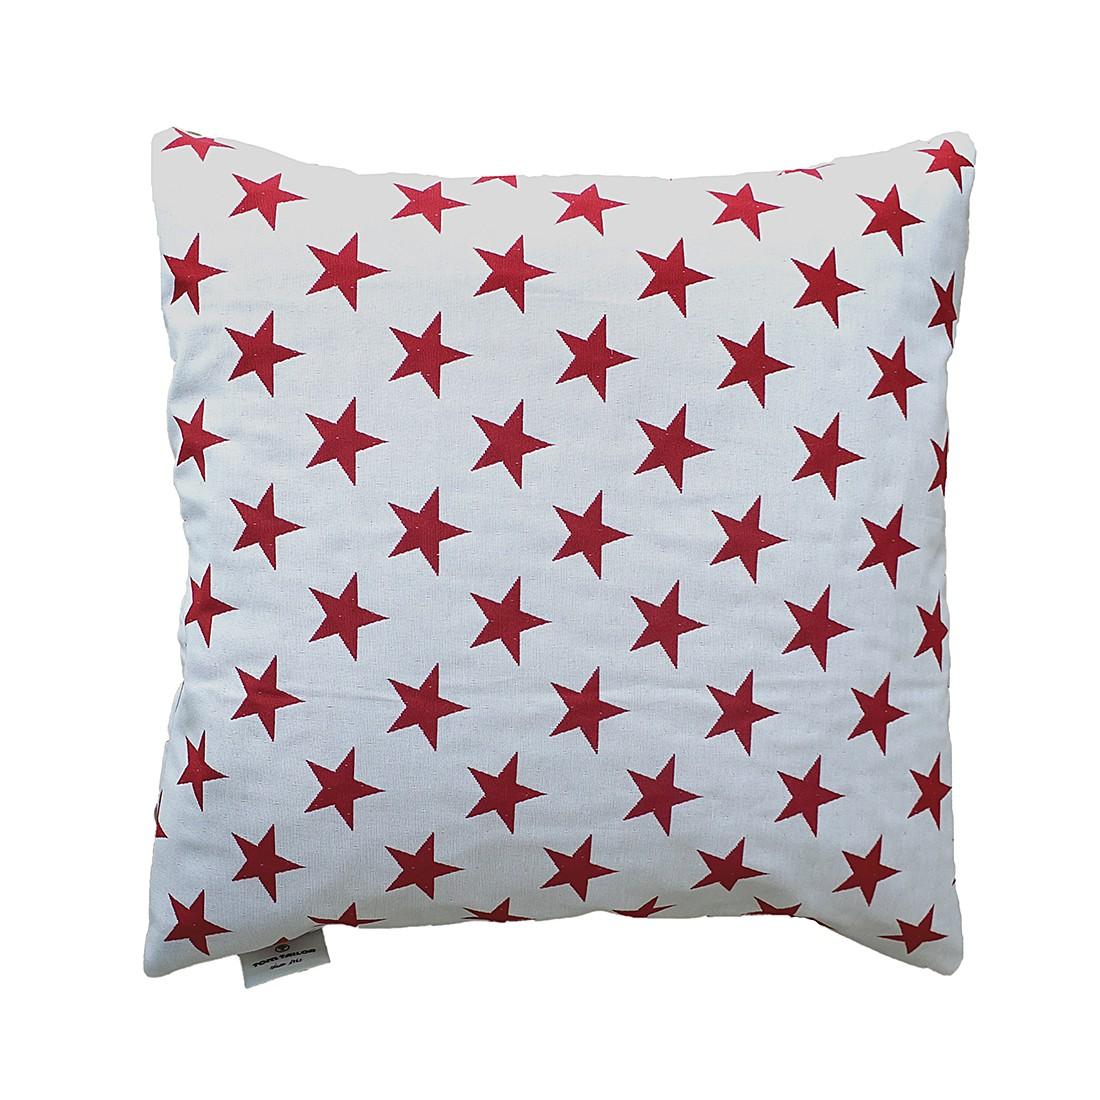 Kissenhülle T-Star (40×40 cm) – Weiß, Tom Tailor günstig kaufen